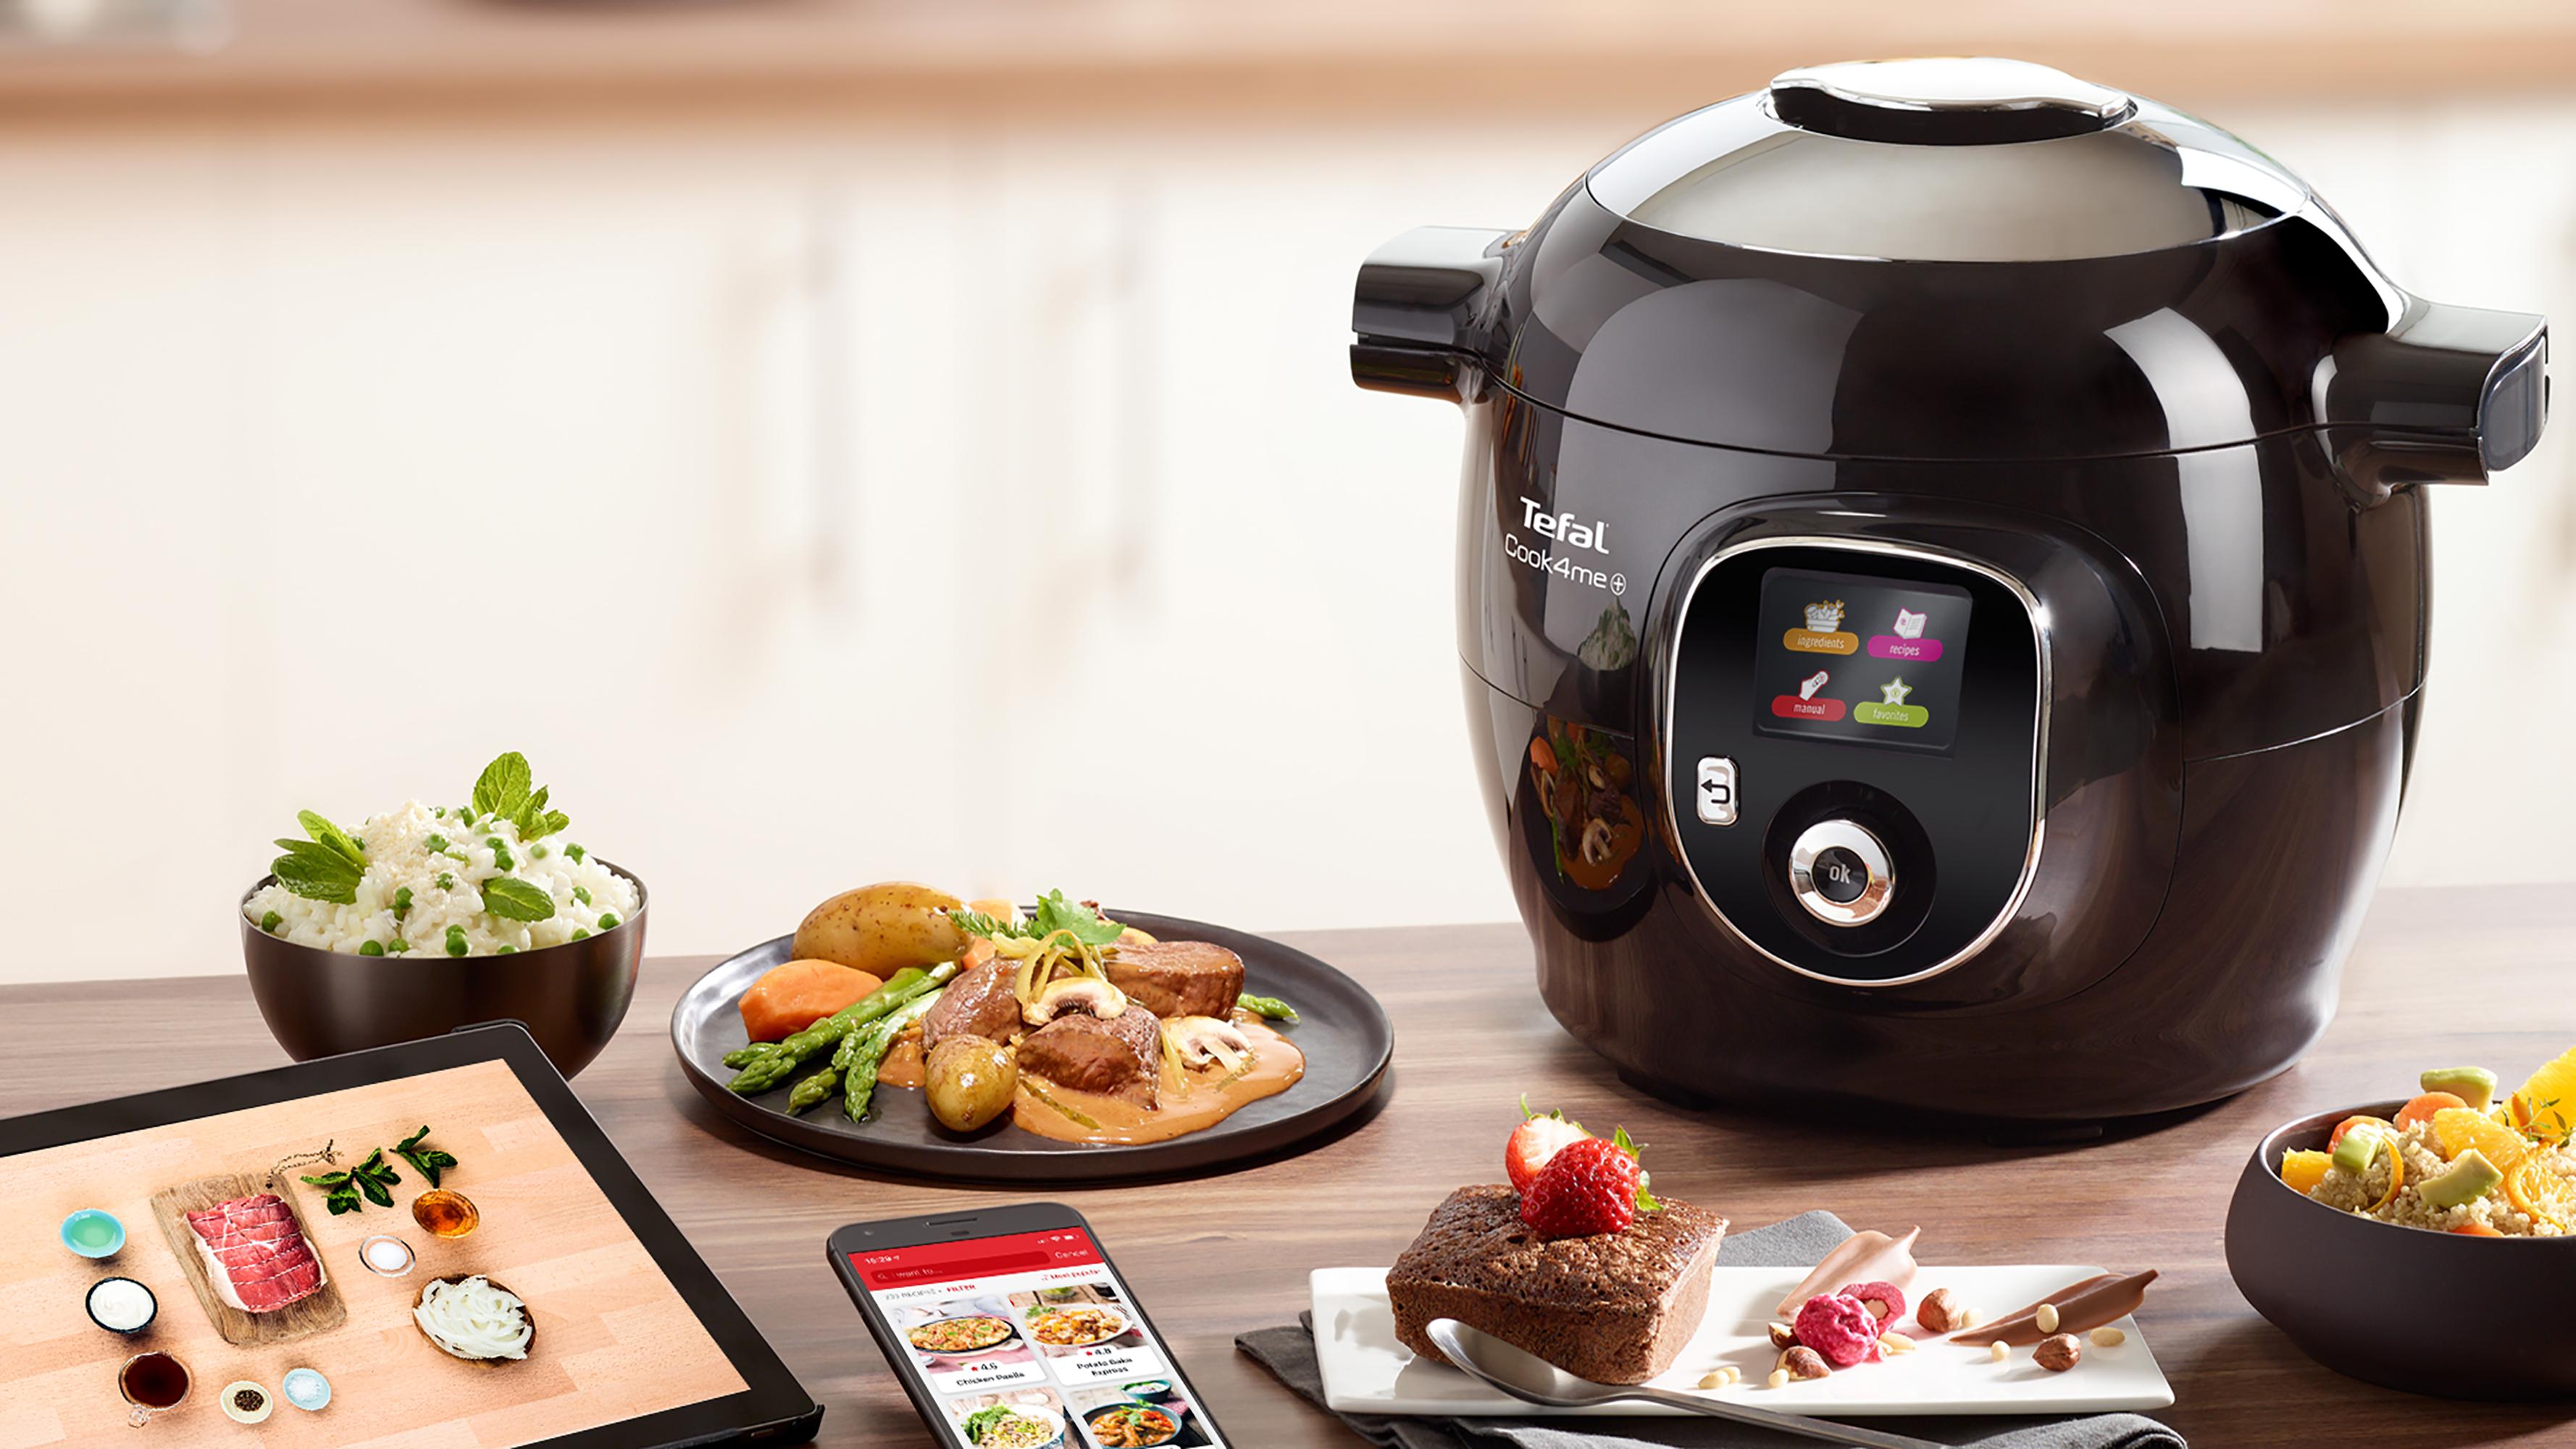 tefal-cook4me-multicooker-pressure-cooker